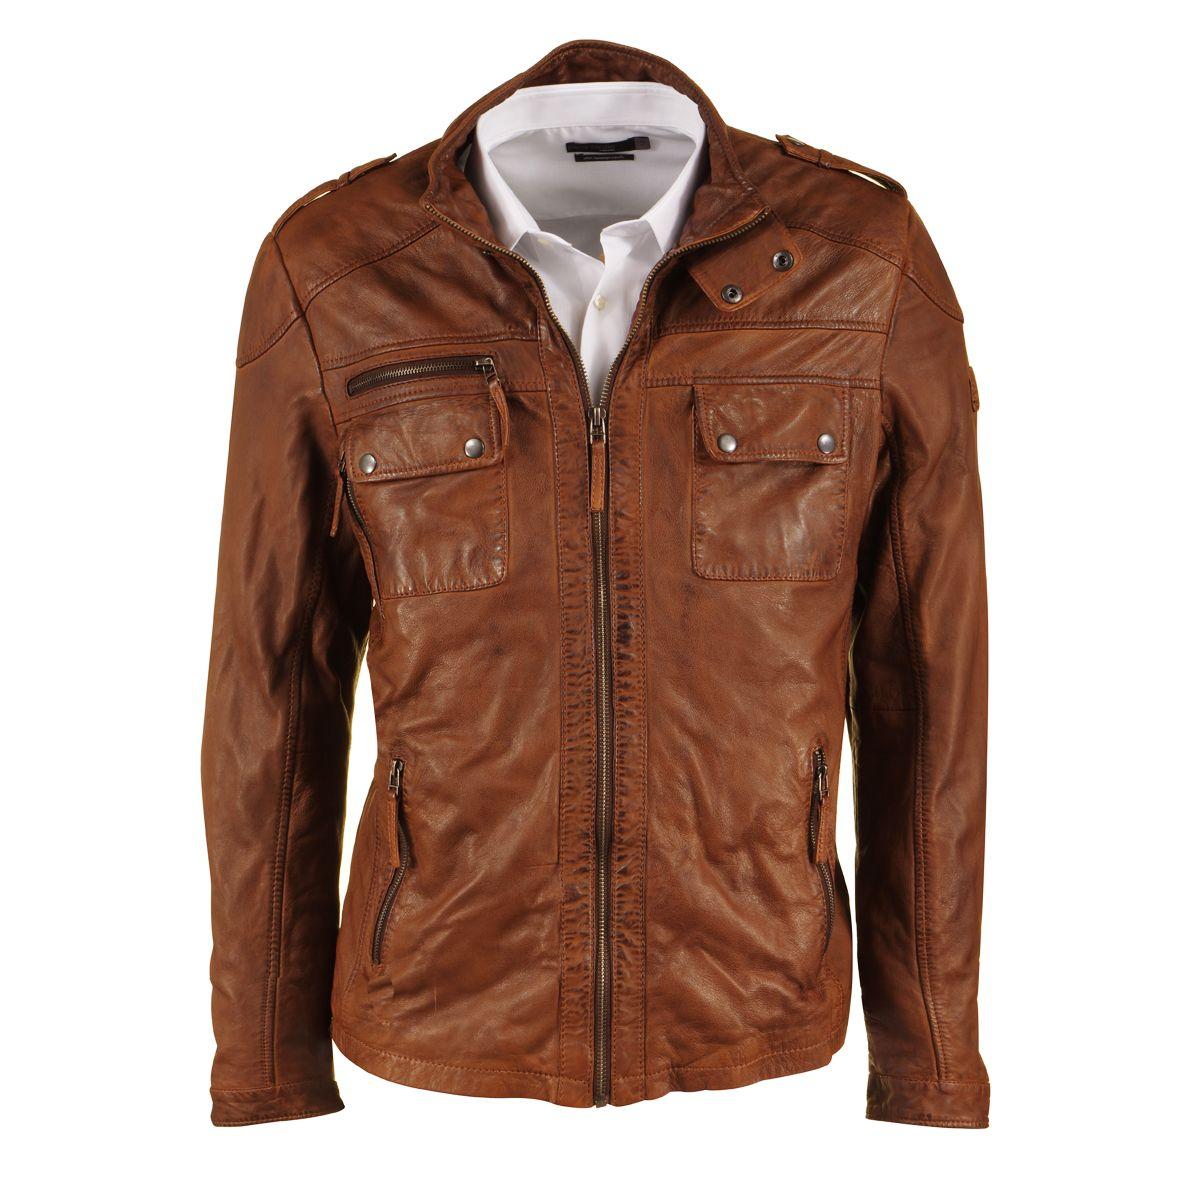 Gants moto cuir marron - Cuire marron au four ...